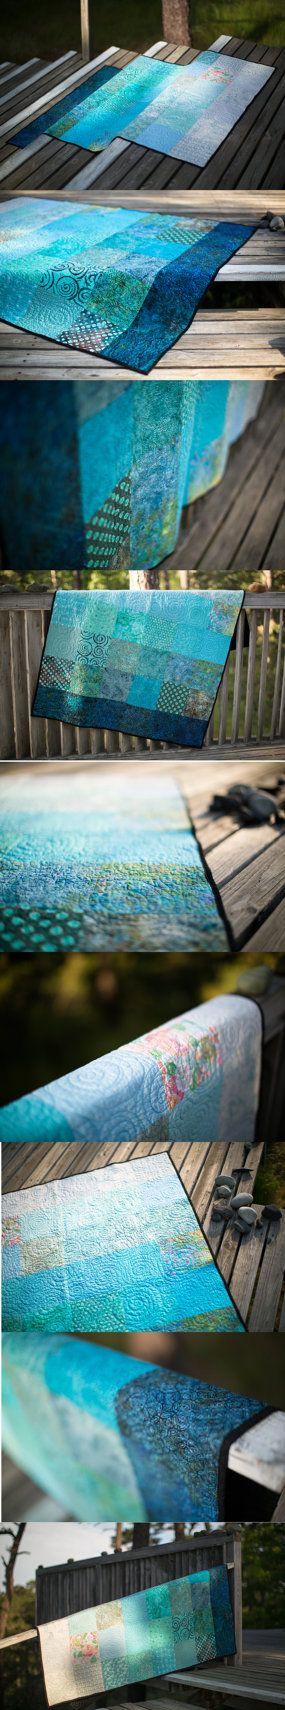 Modern Quilts Throw Size Quilt Handmade Quilt by btaylorquilts